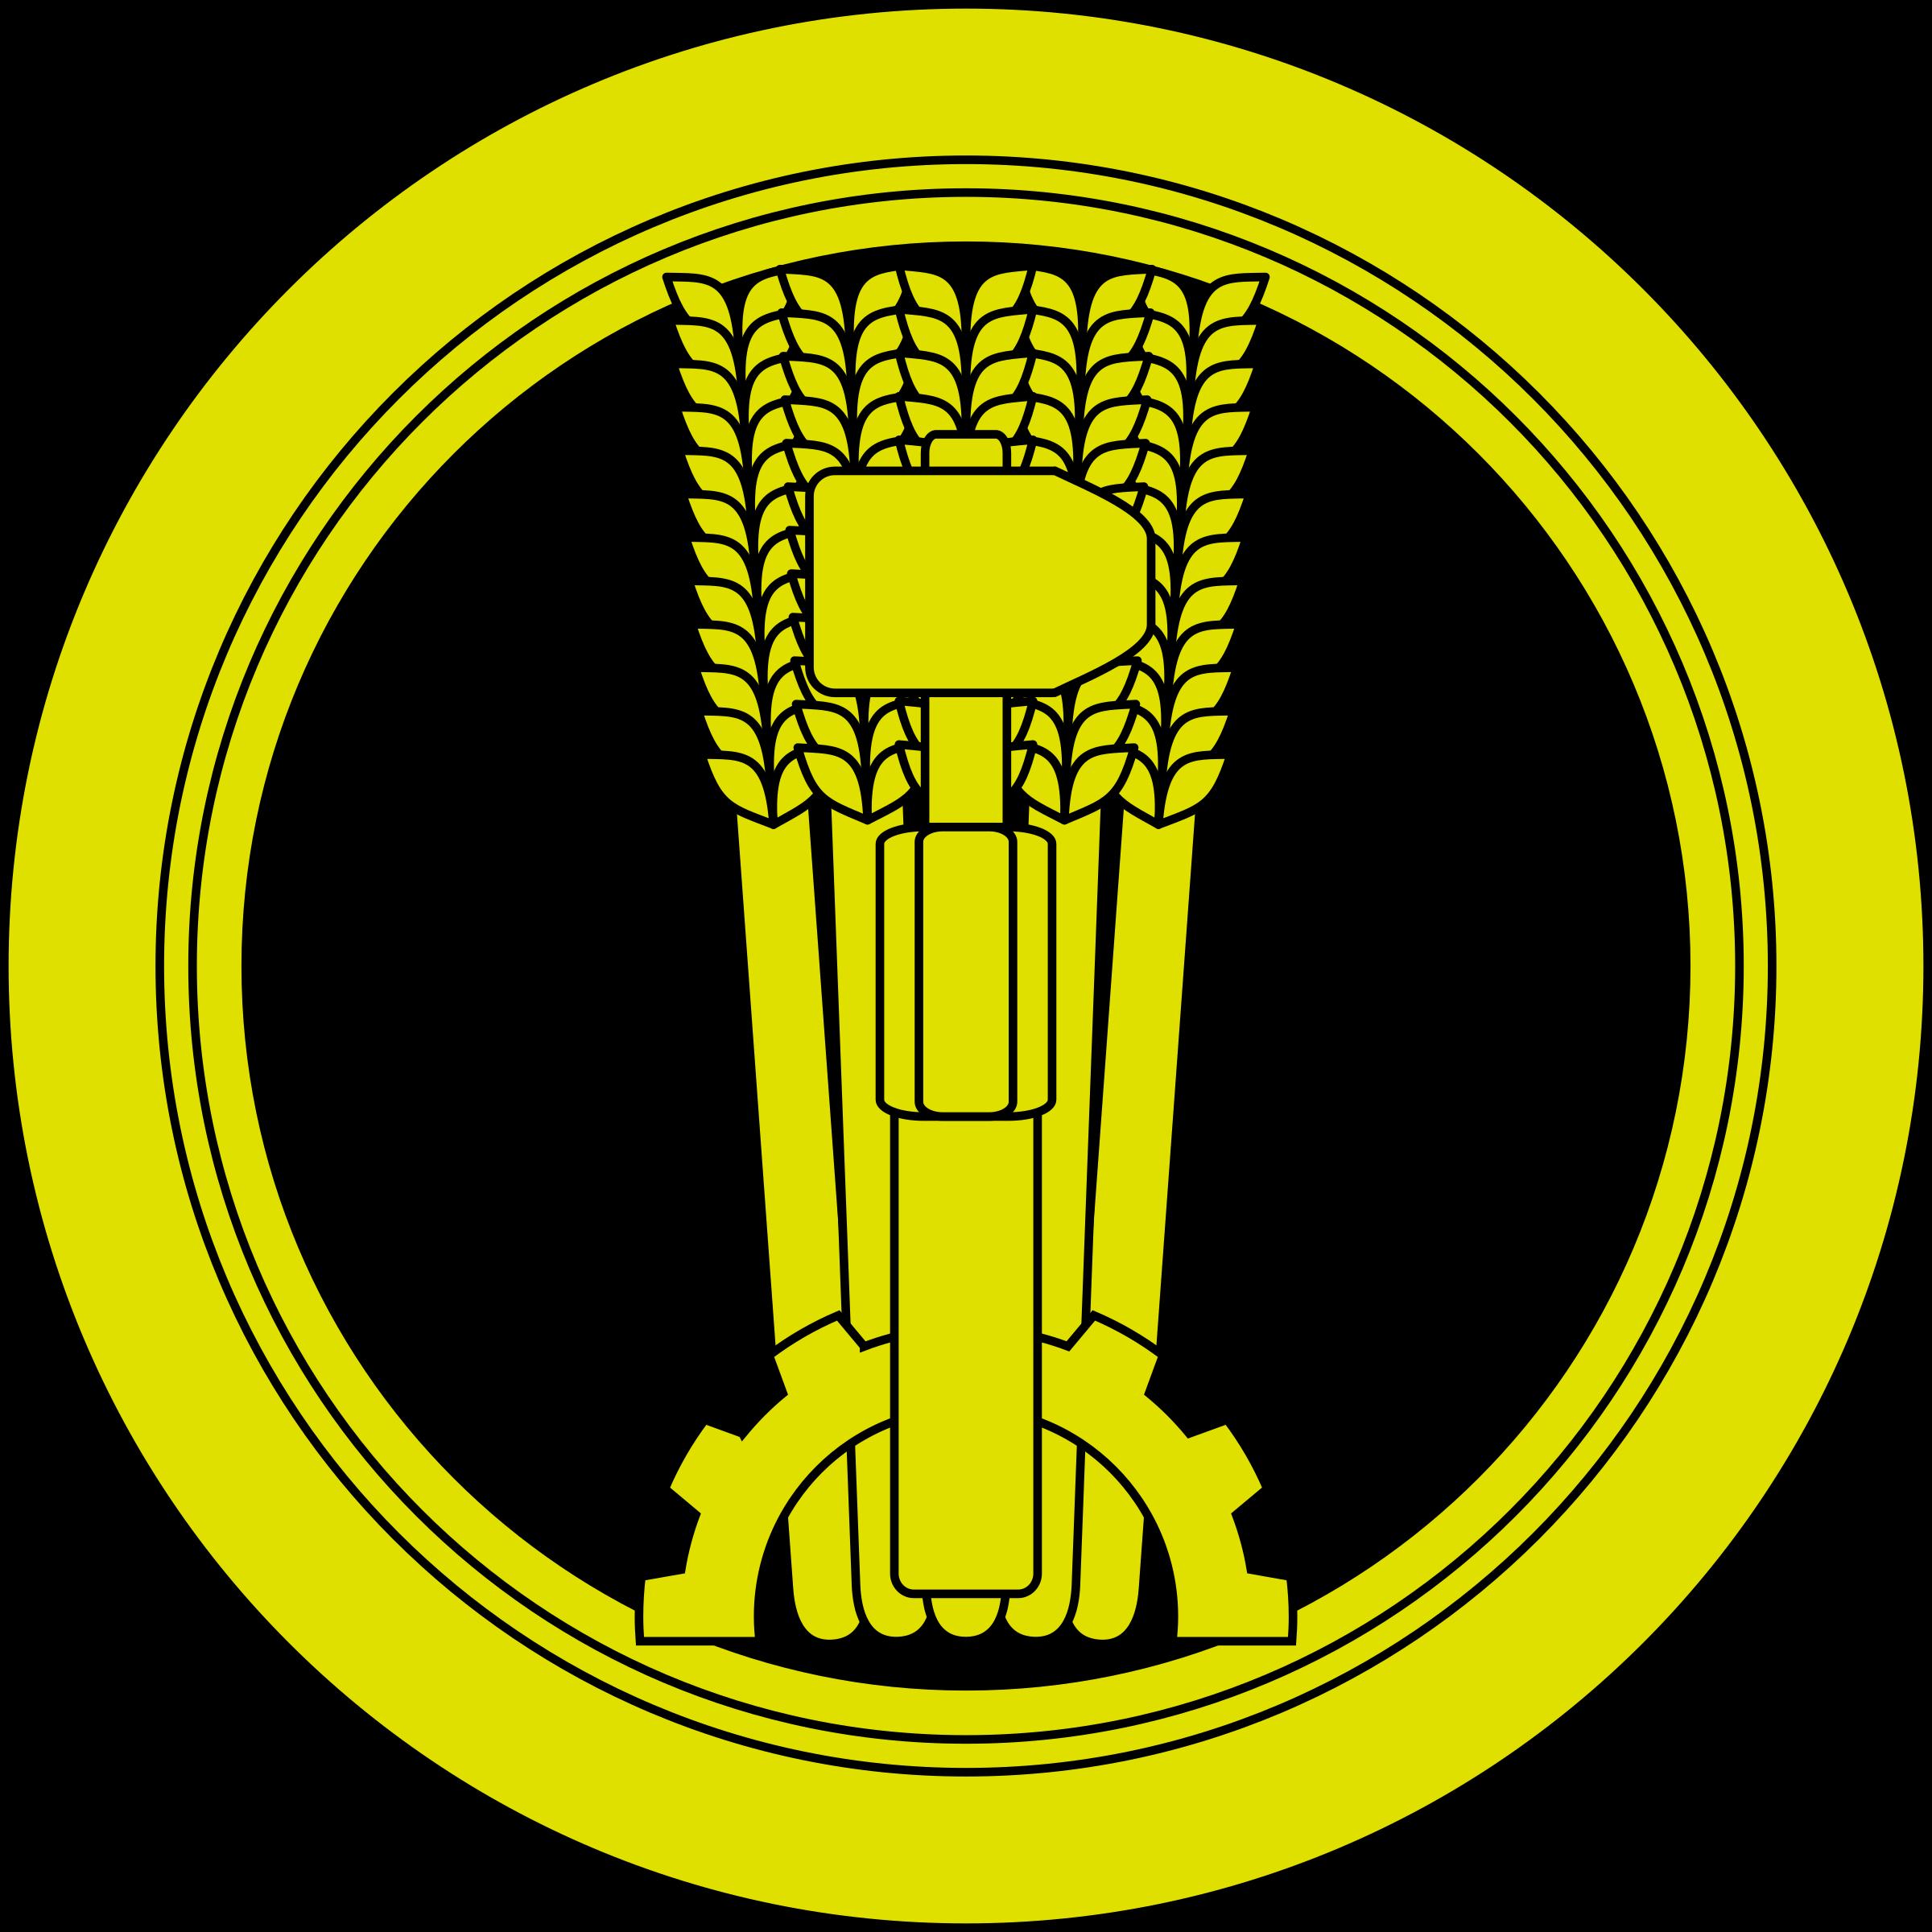 Labor logo big image. Working clipart farm labour